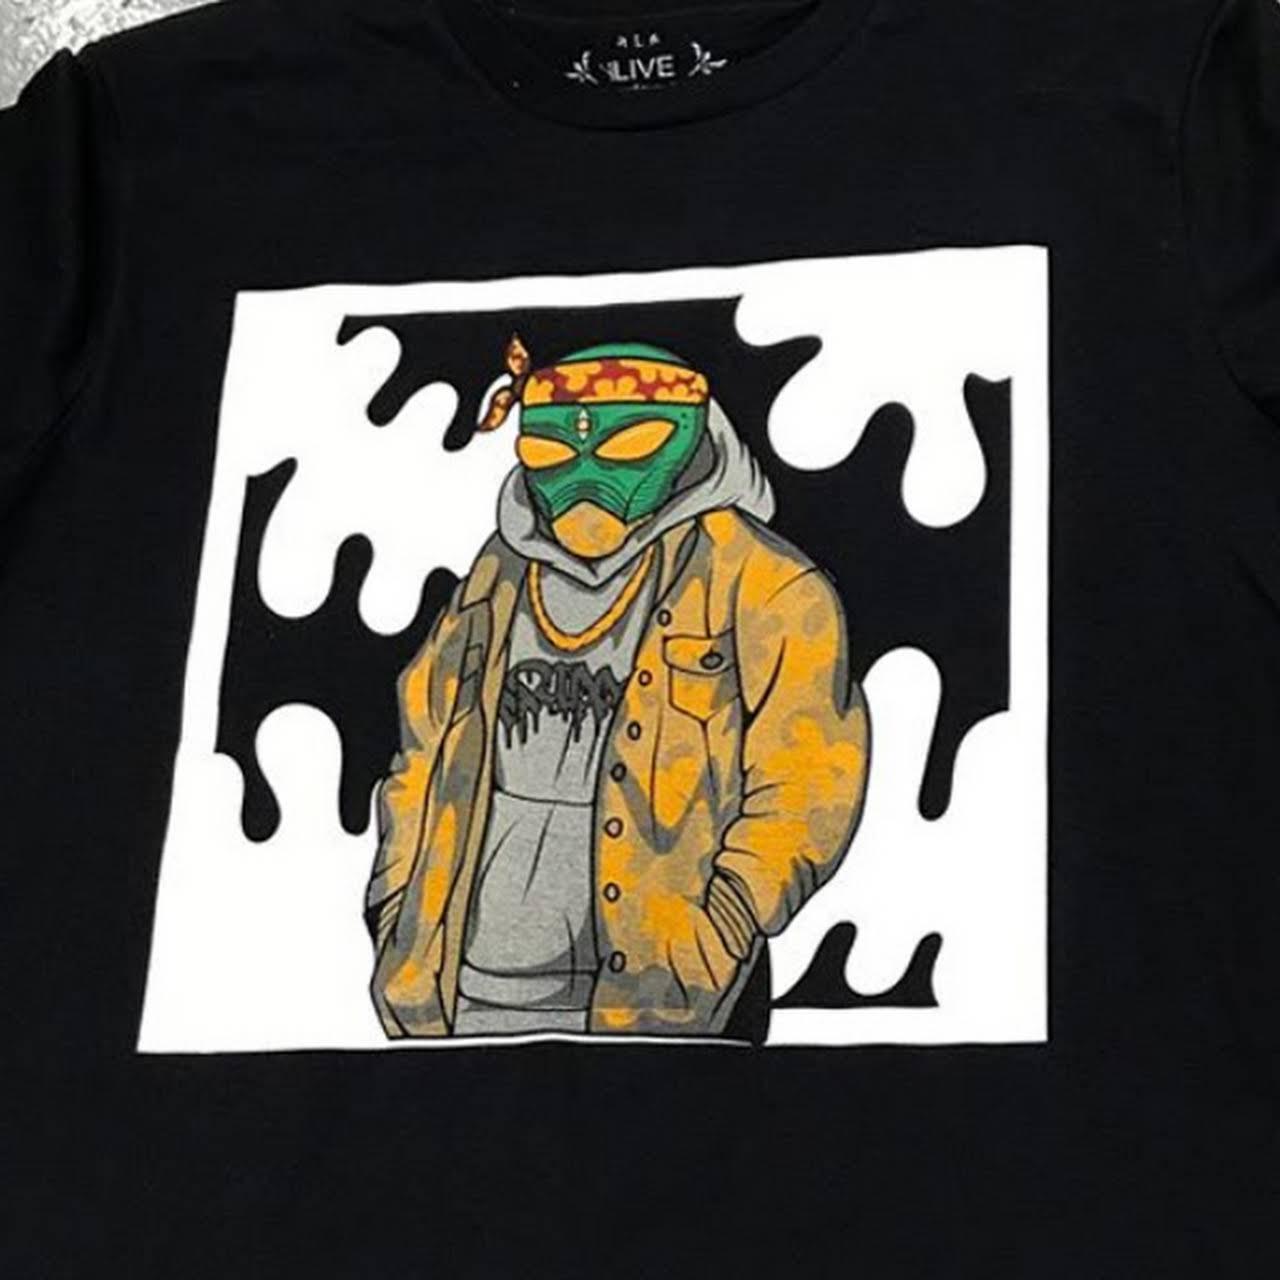 USA Tees - Custom T-shirt Store in Brooklyn a90b2b49936